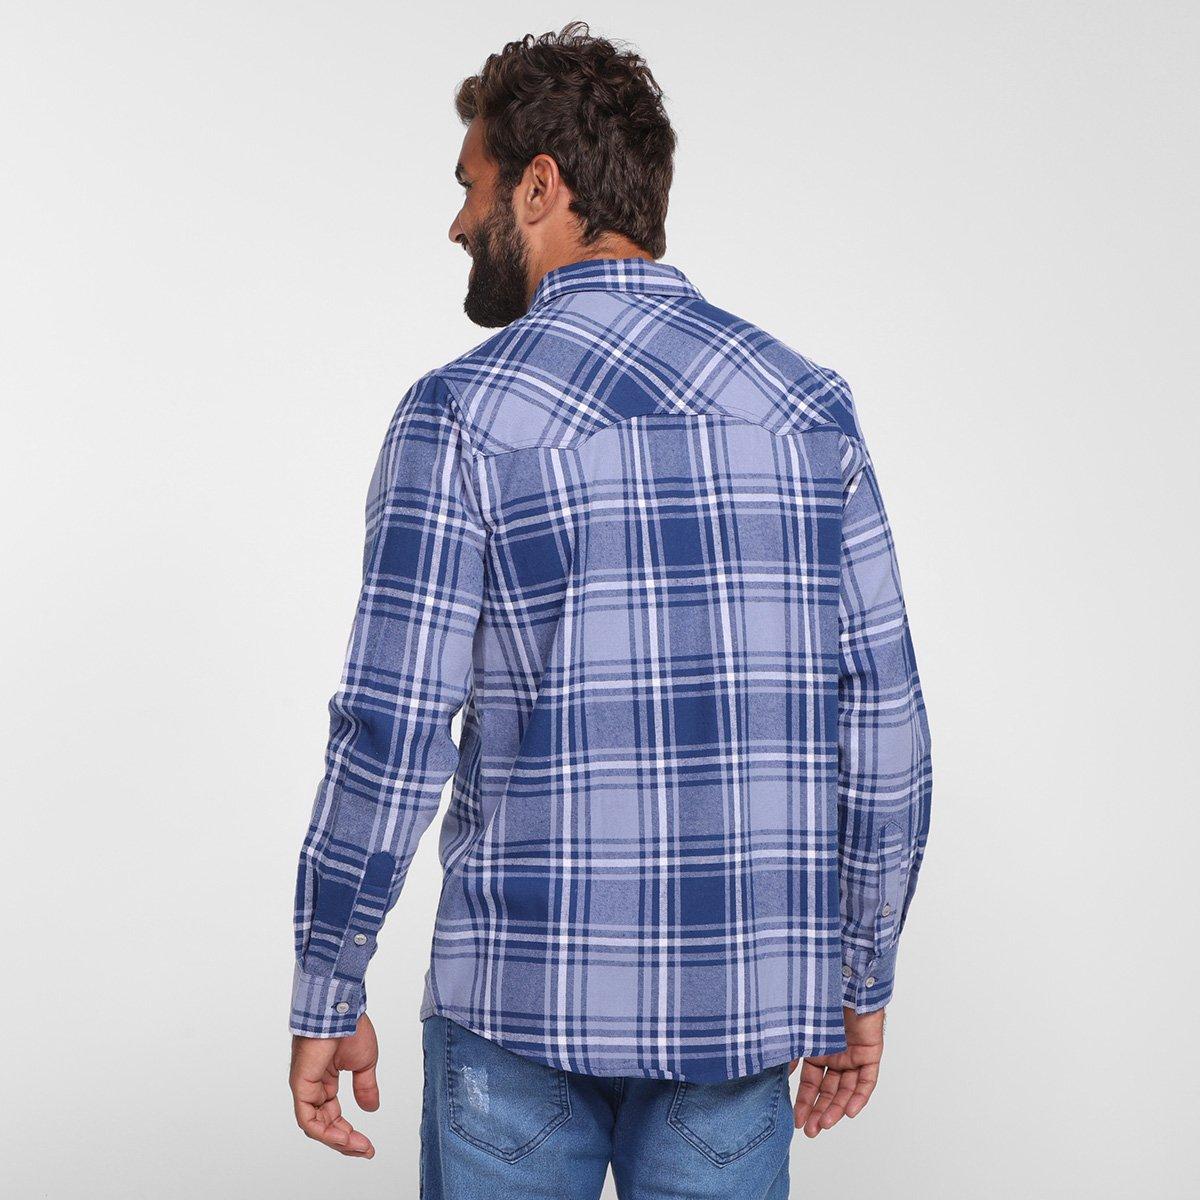 Foto 2 - Camisa Xadrez Manga Longa Gajang Lumber Masculina